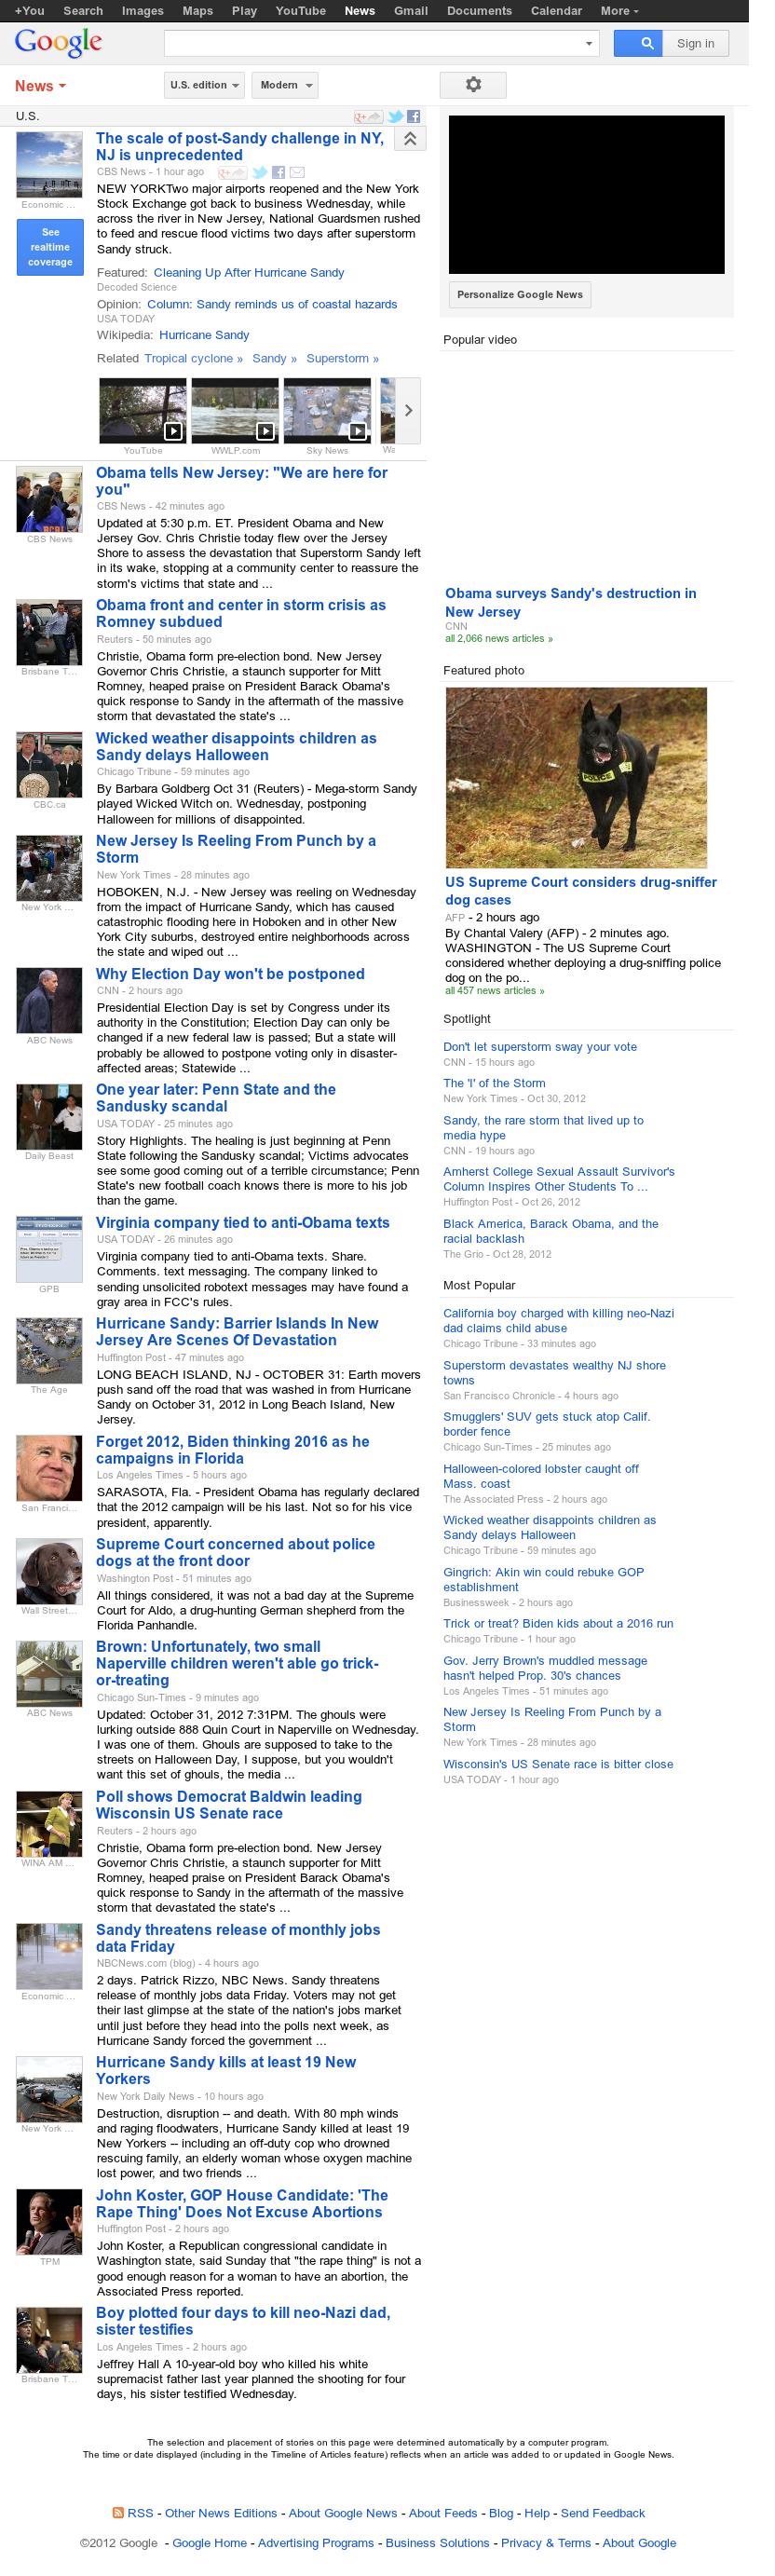 Google News: U.S. at Thursday Nov. 1, 2012, 1:11 a.m. UTC